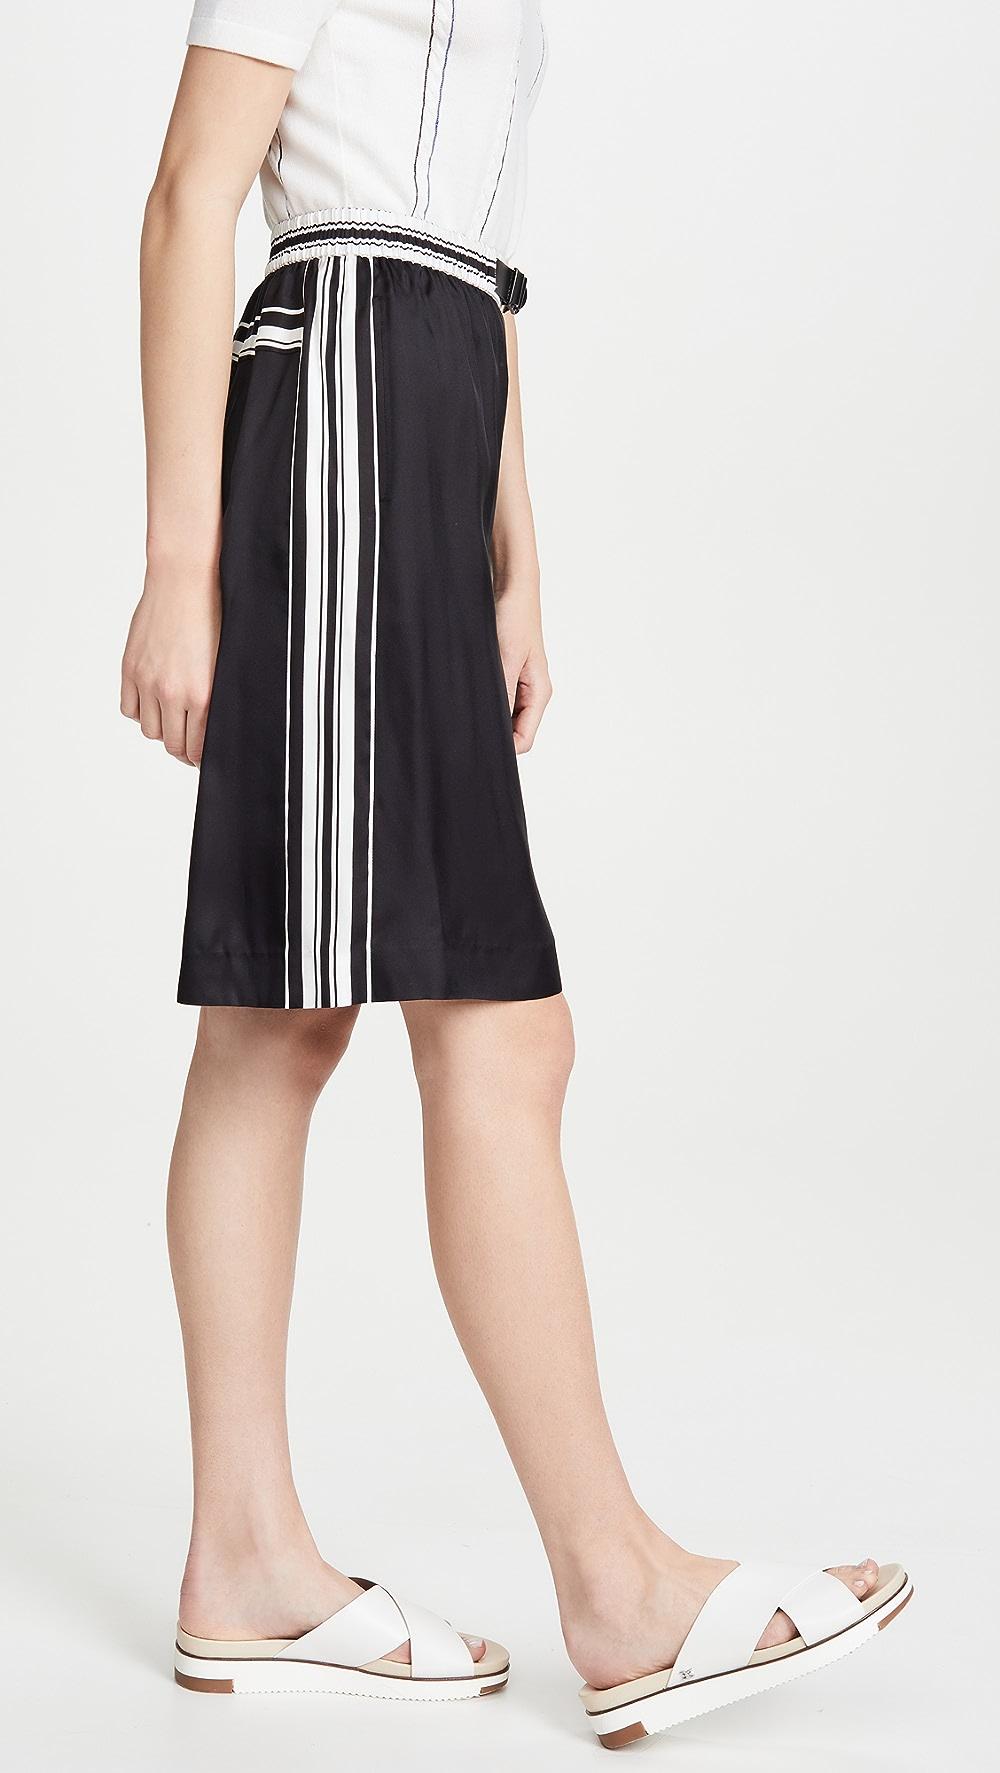 Brilliant Rag & Bone - Isadora Shorts At All Costs